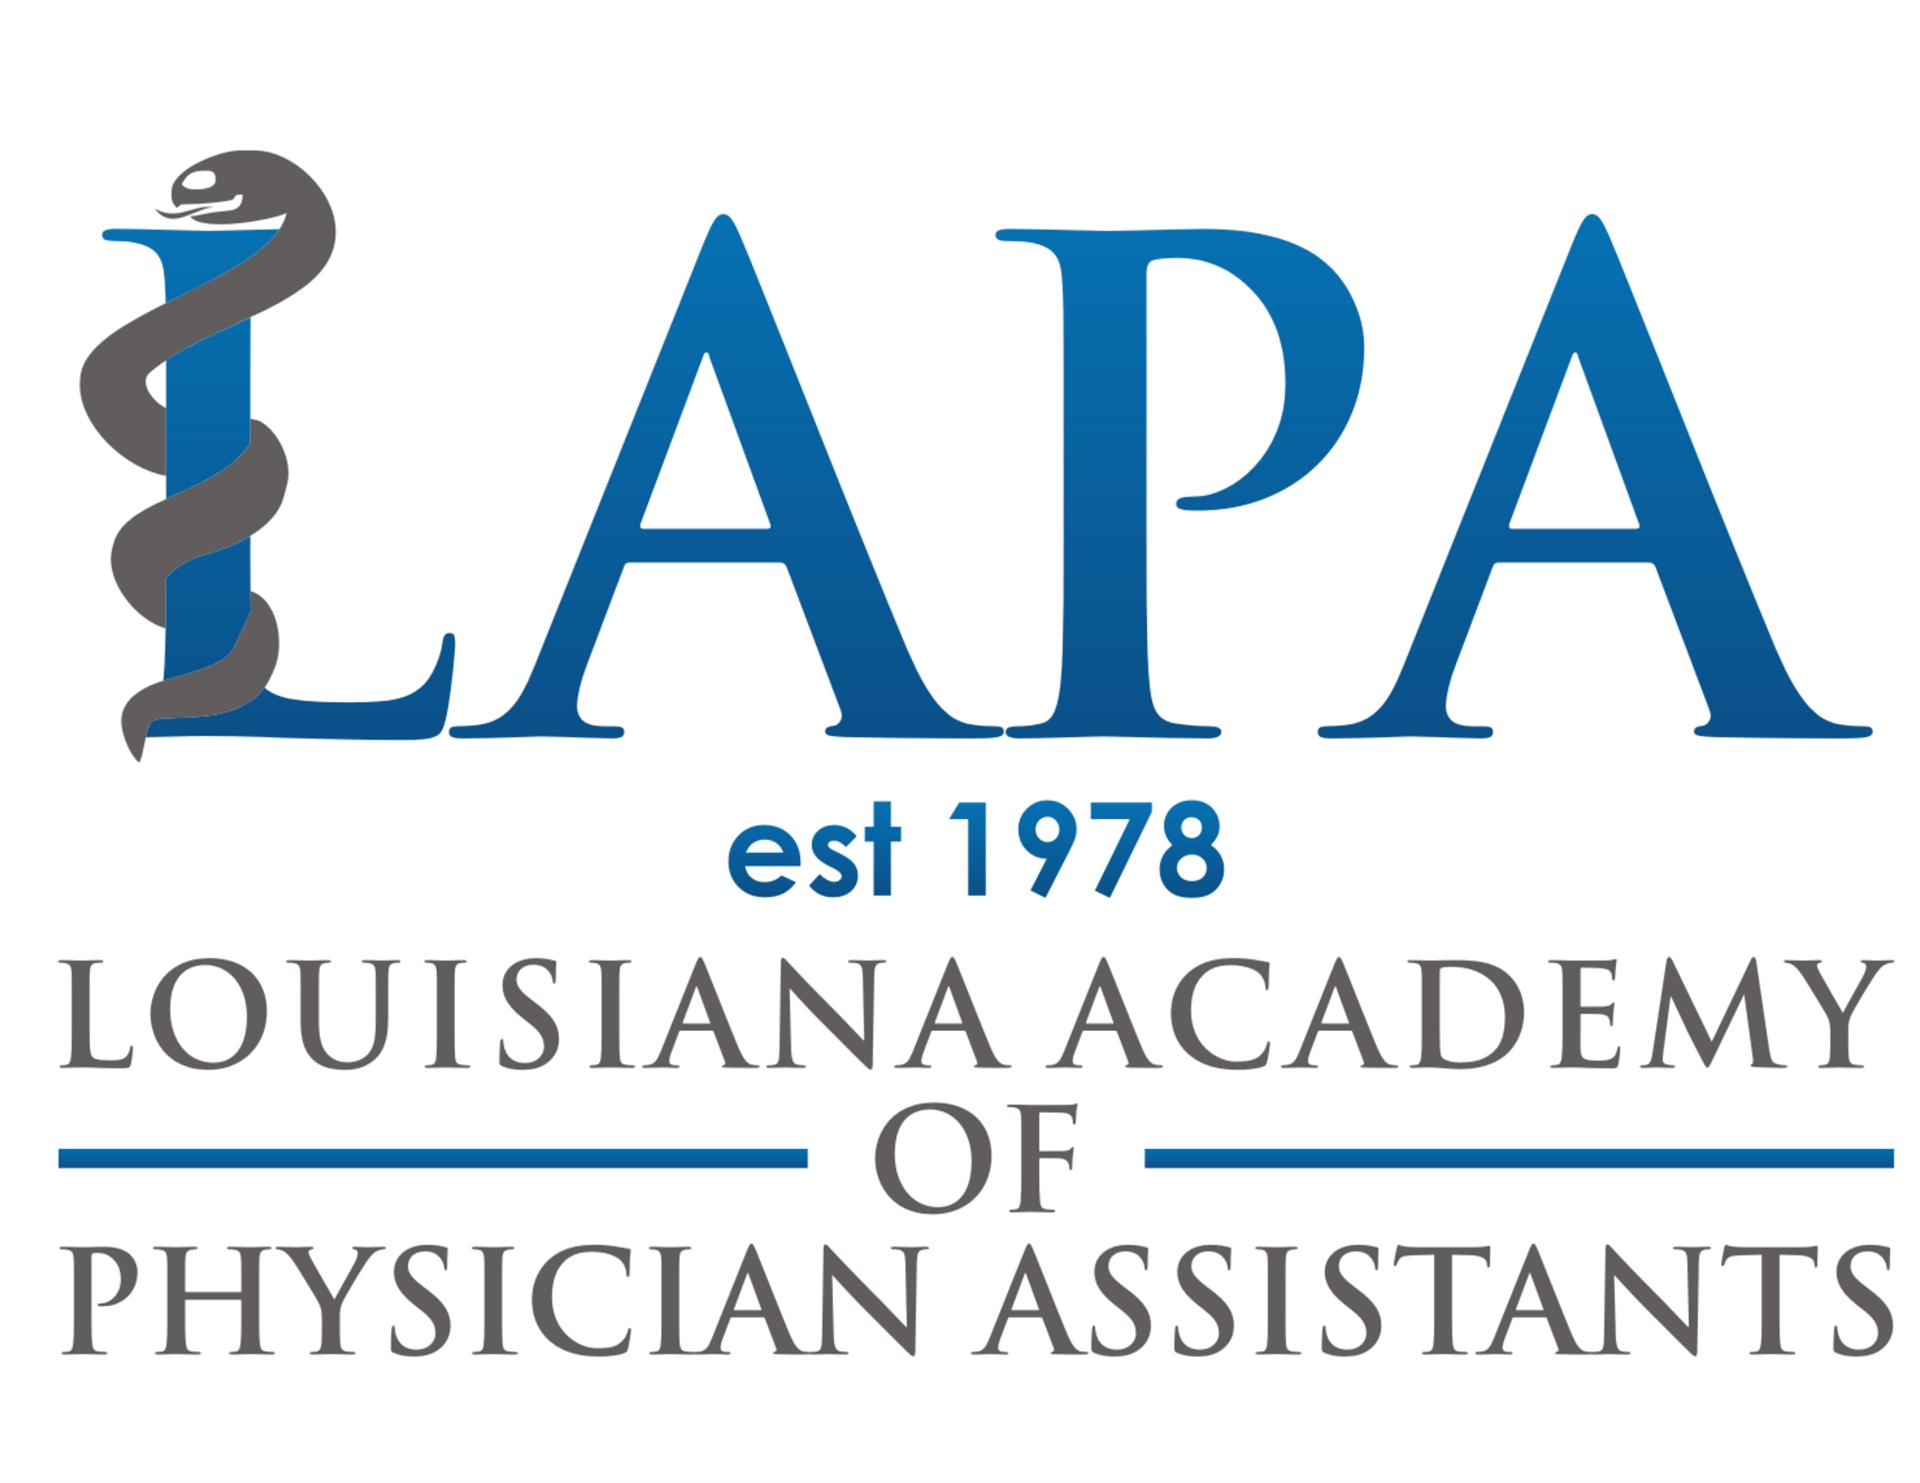 Louisiana Academy of Physician Assistants